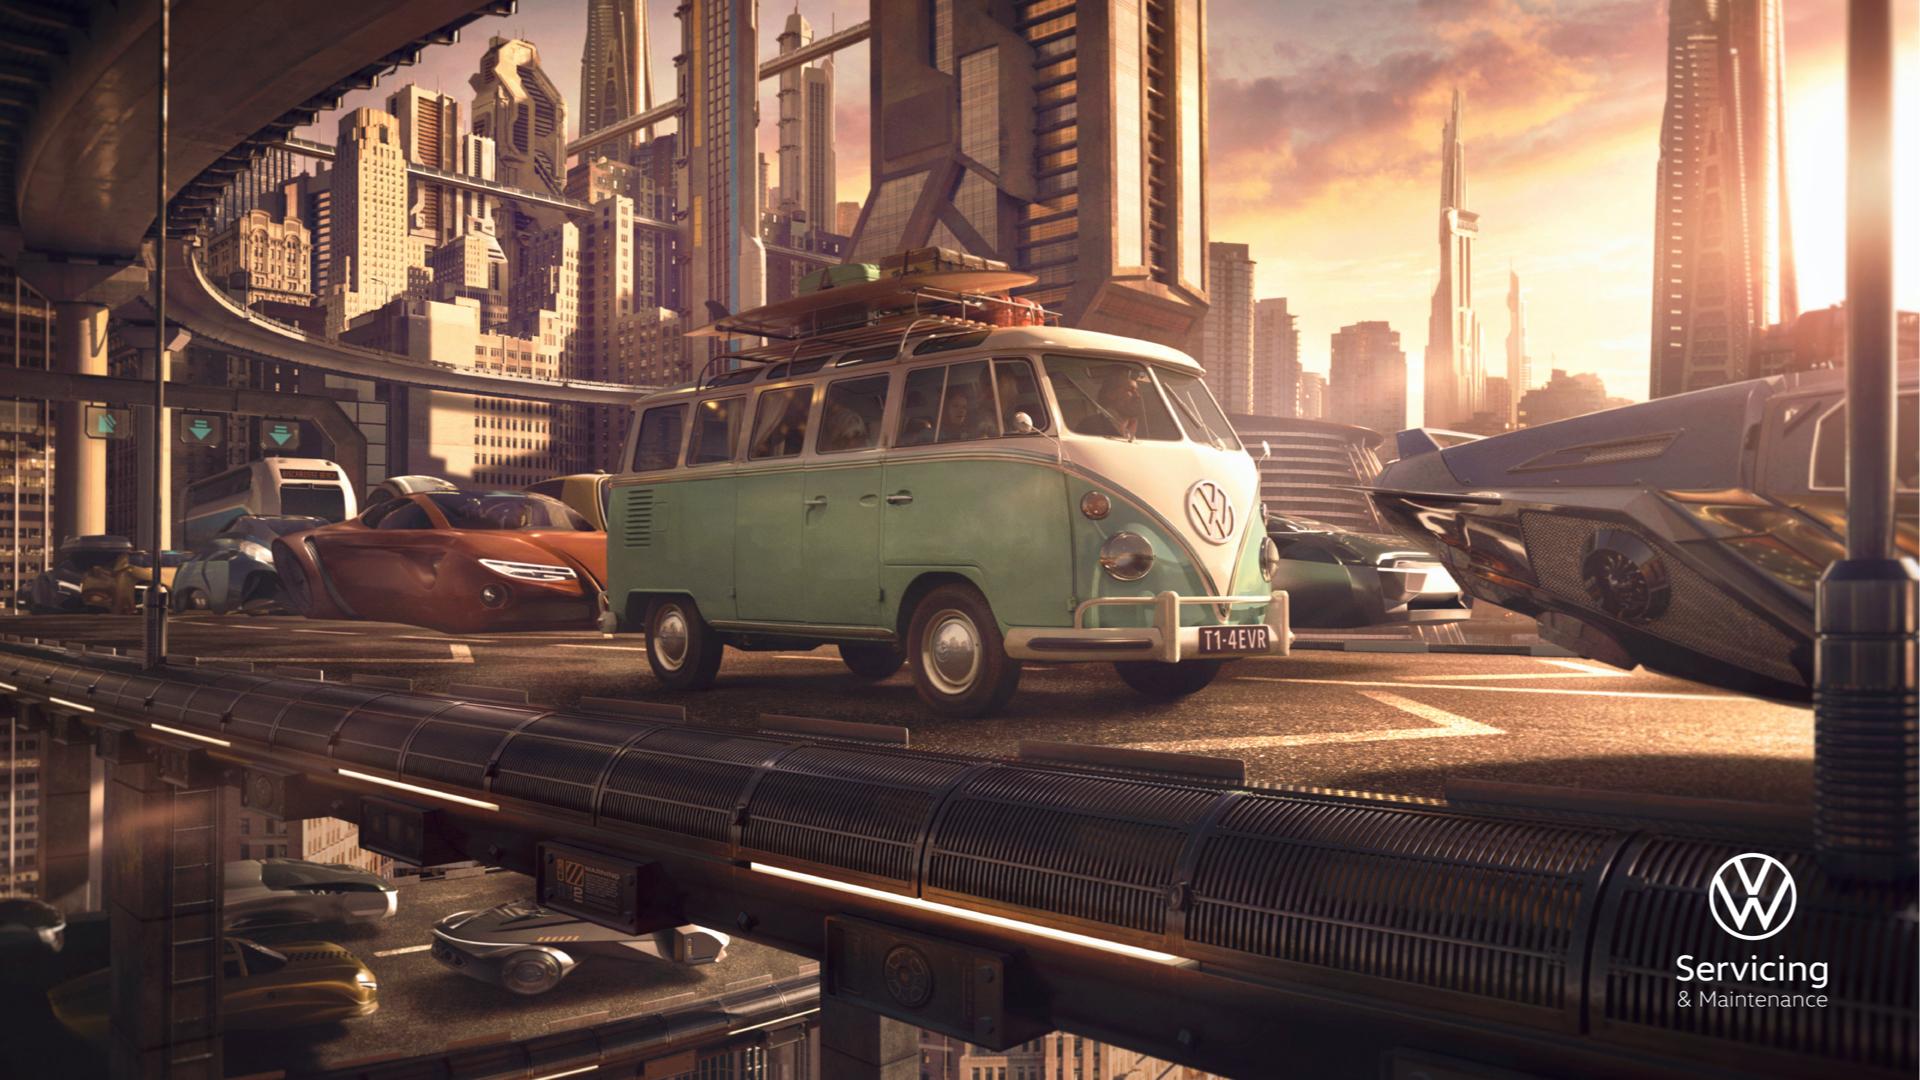 IMAGE 2 VW FUTUR